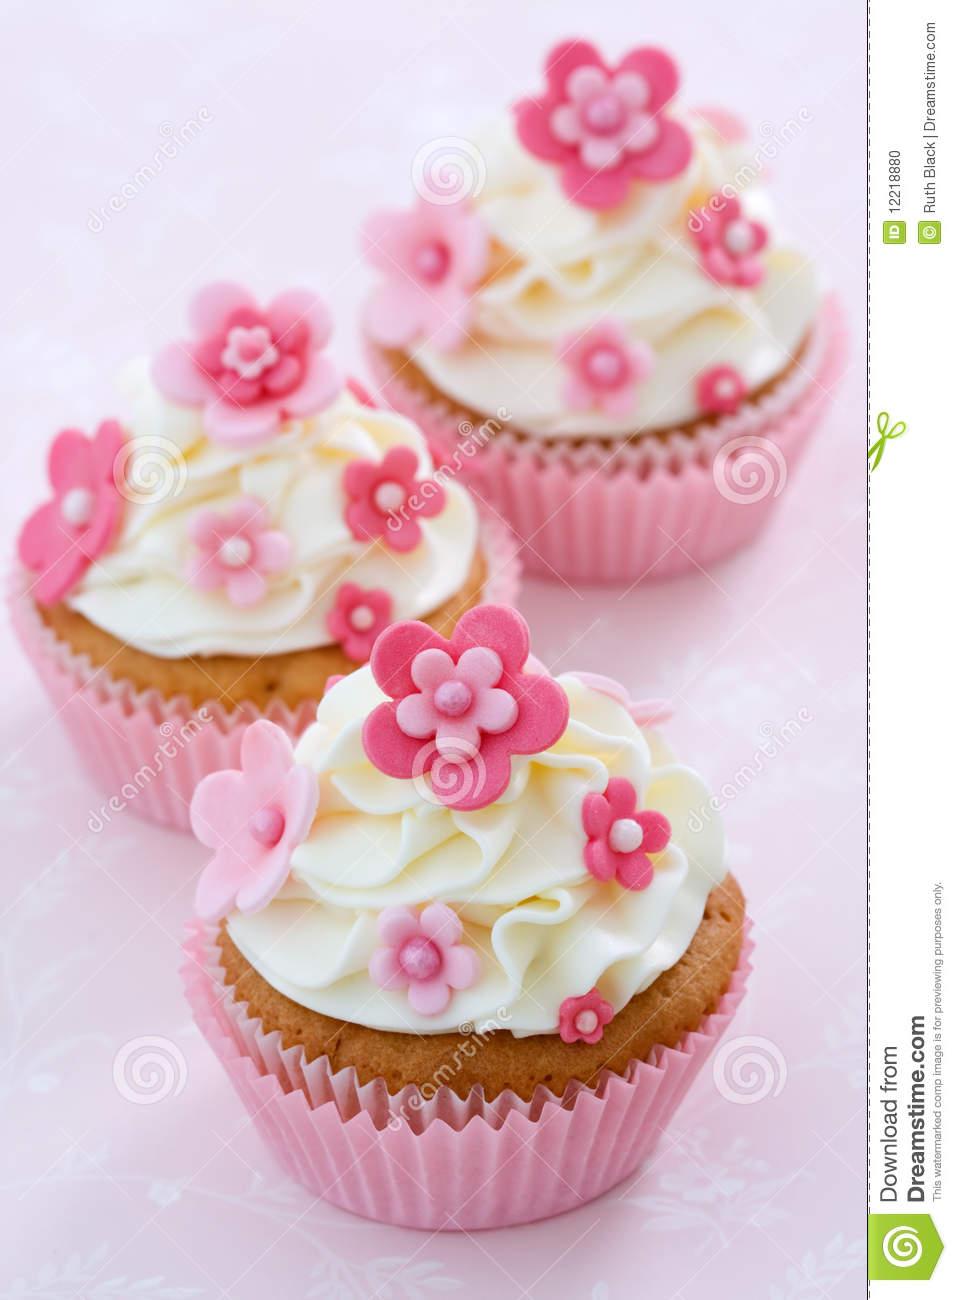 9 Pink Fondant Flower Cupcakes Photo Pink Flower Cupcake Cupcakes